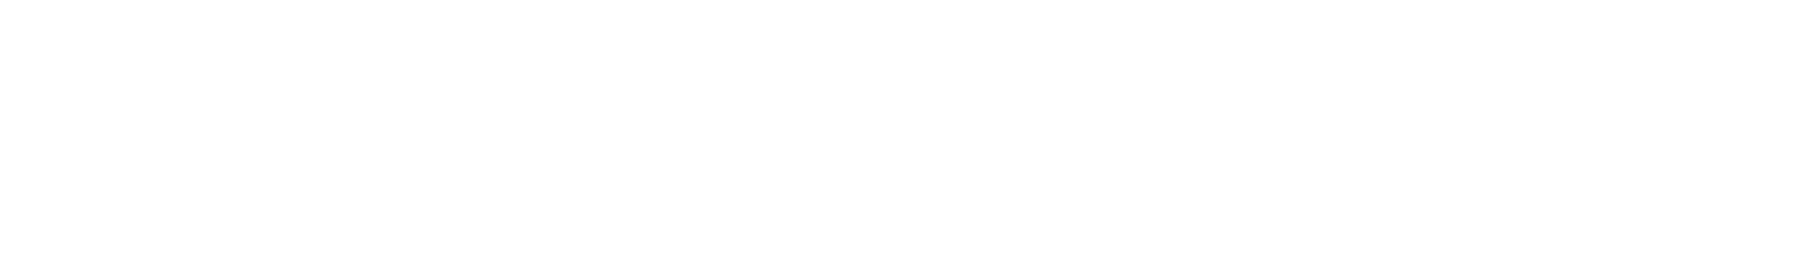 perc 1 43